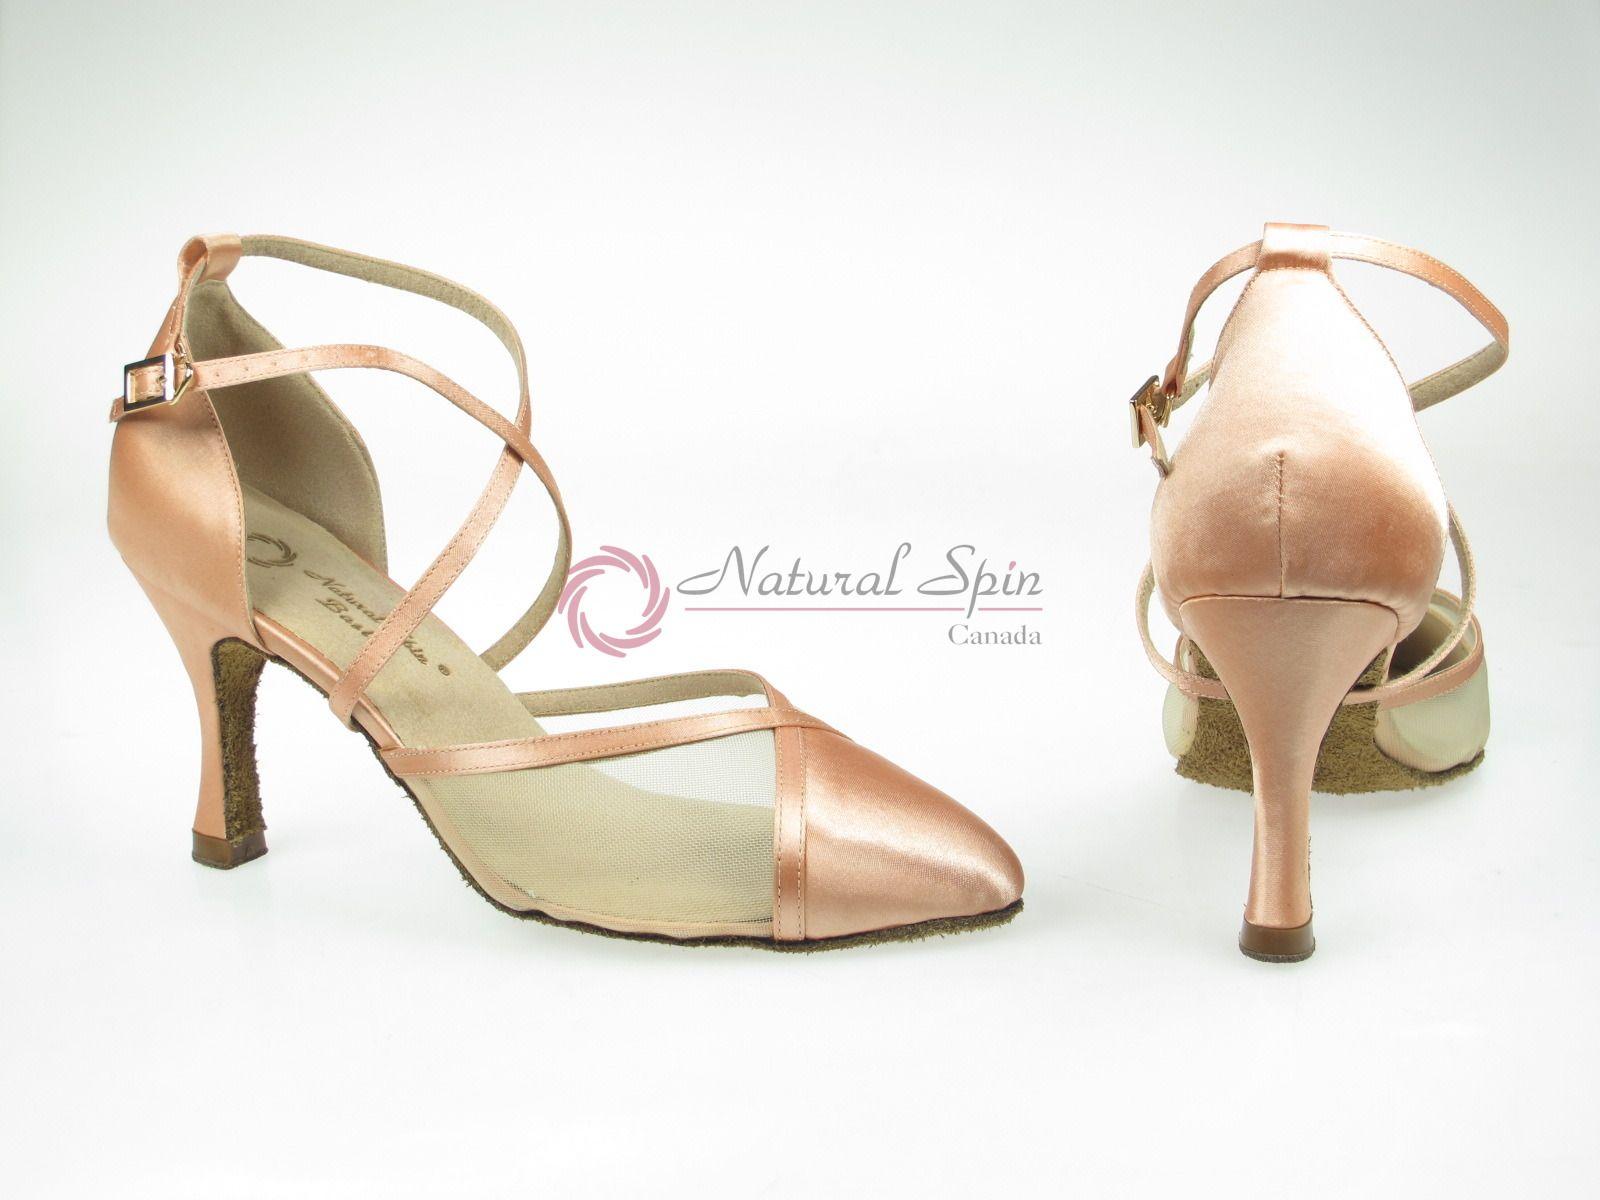 Natural Spin Basic Standard & Smooth Shoes(Closed Toe): L1305-05_FleshKS